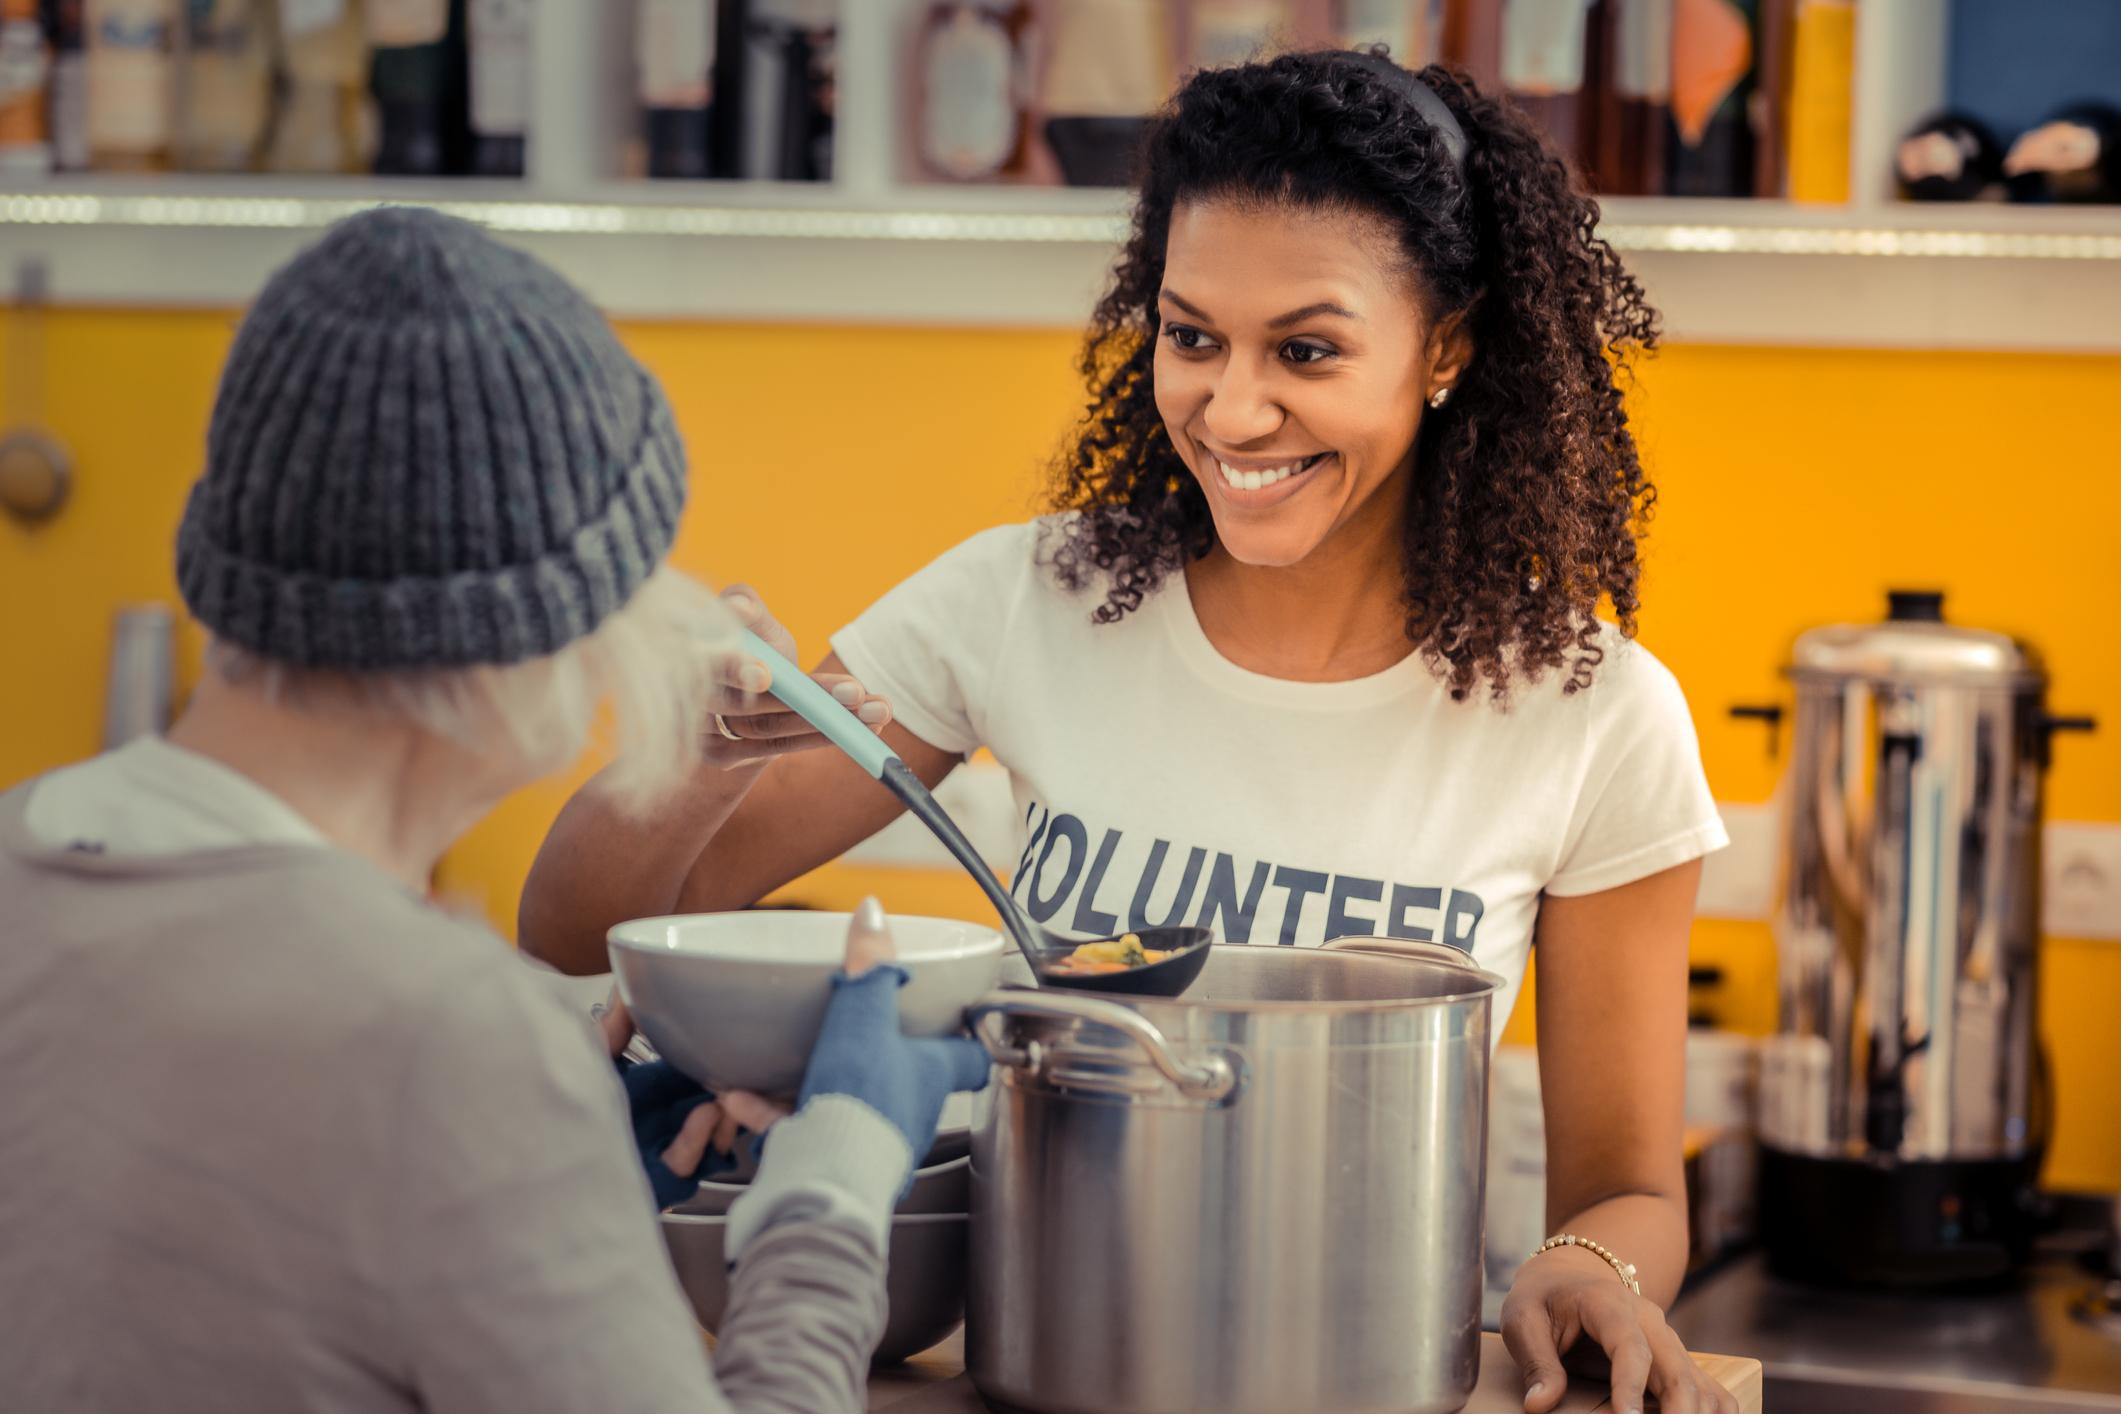 Woman serving Soup to a homeless woman